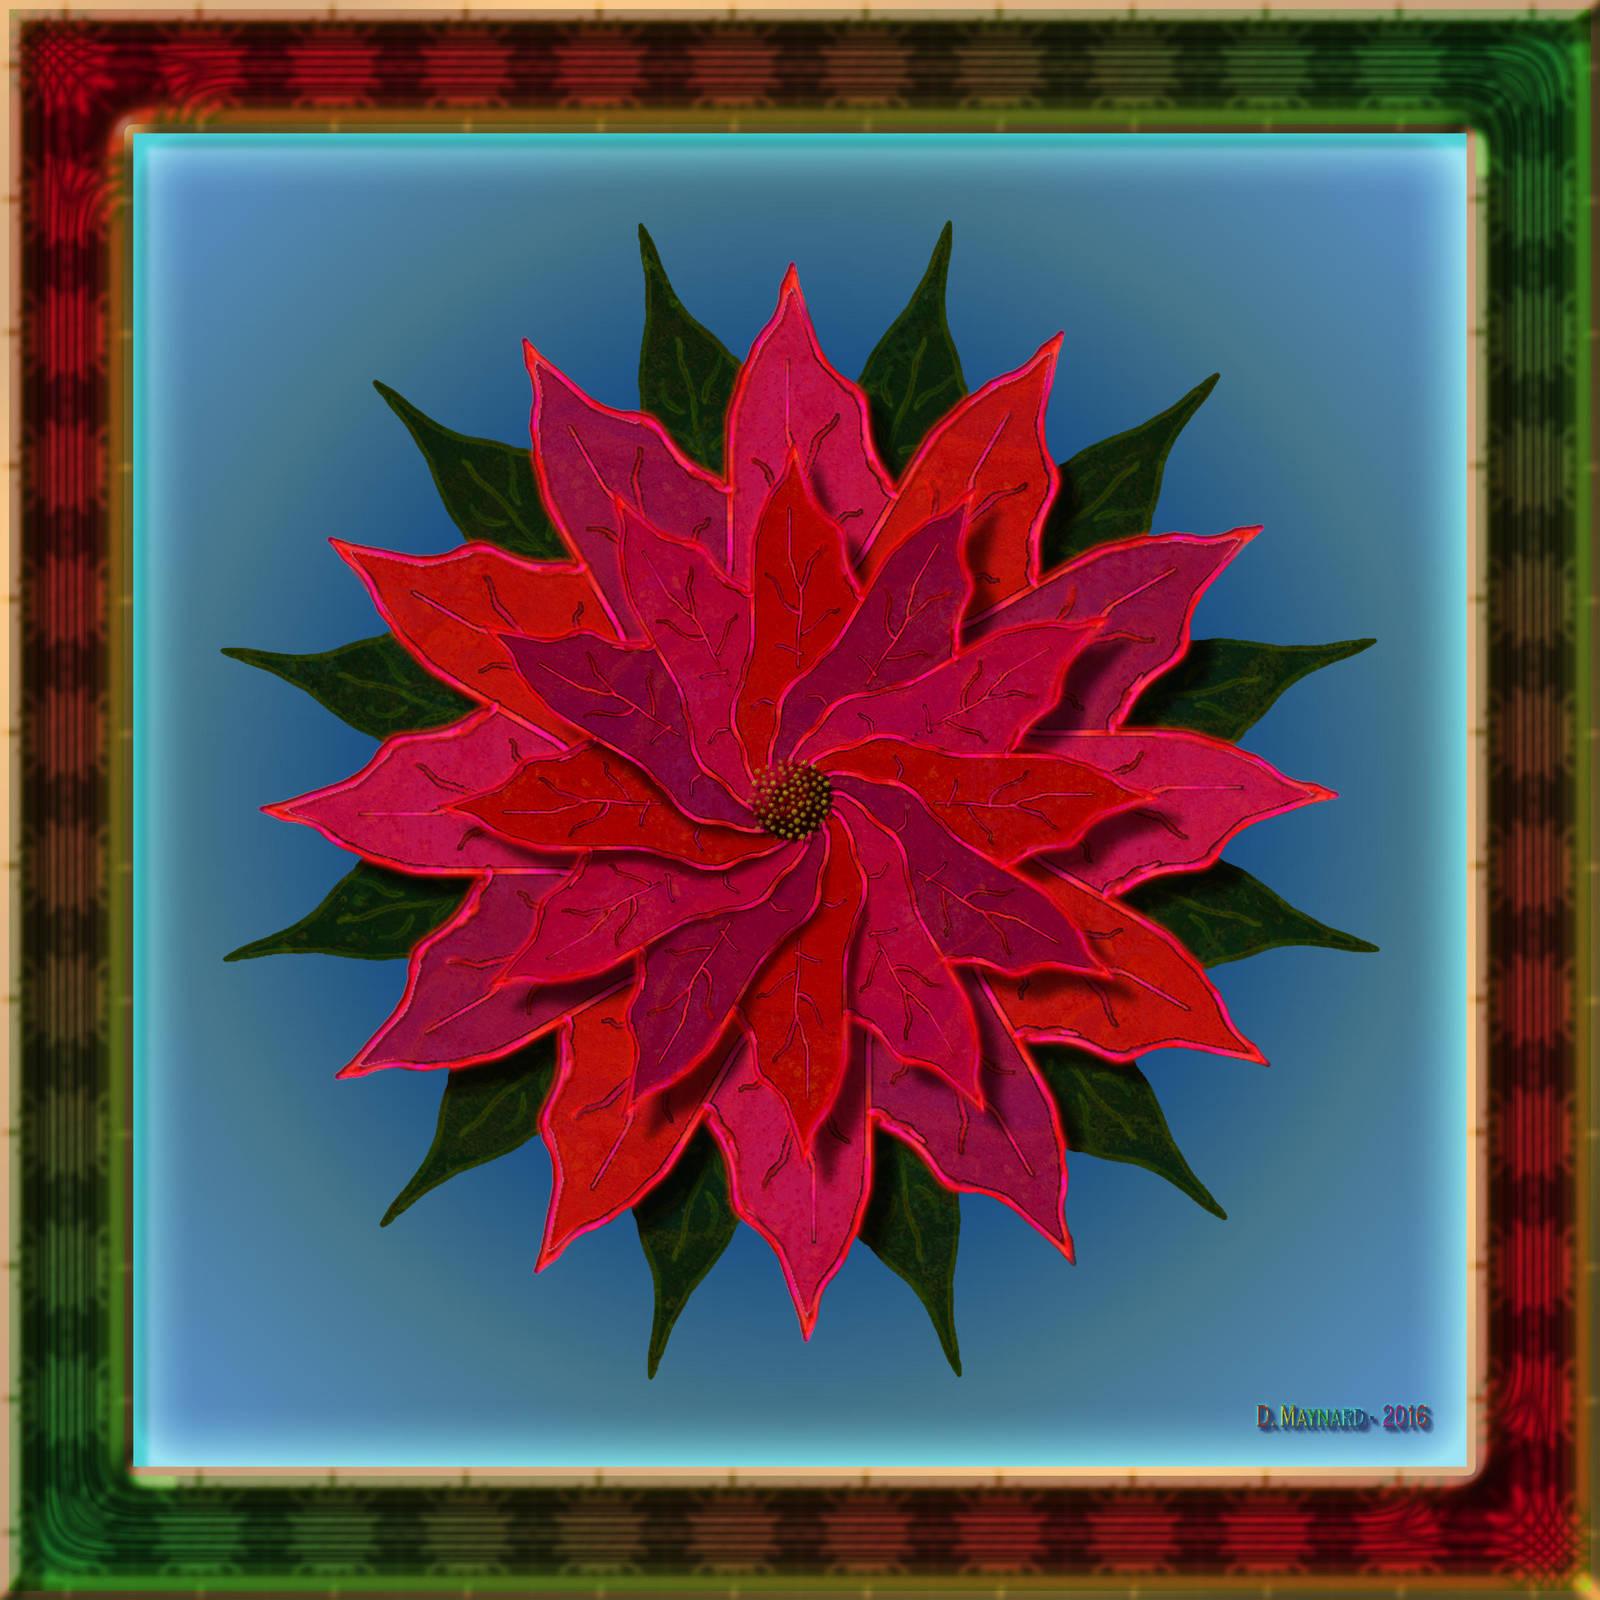 20161202-Poinsettia-P001-v9 by quasihedron